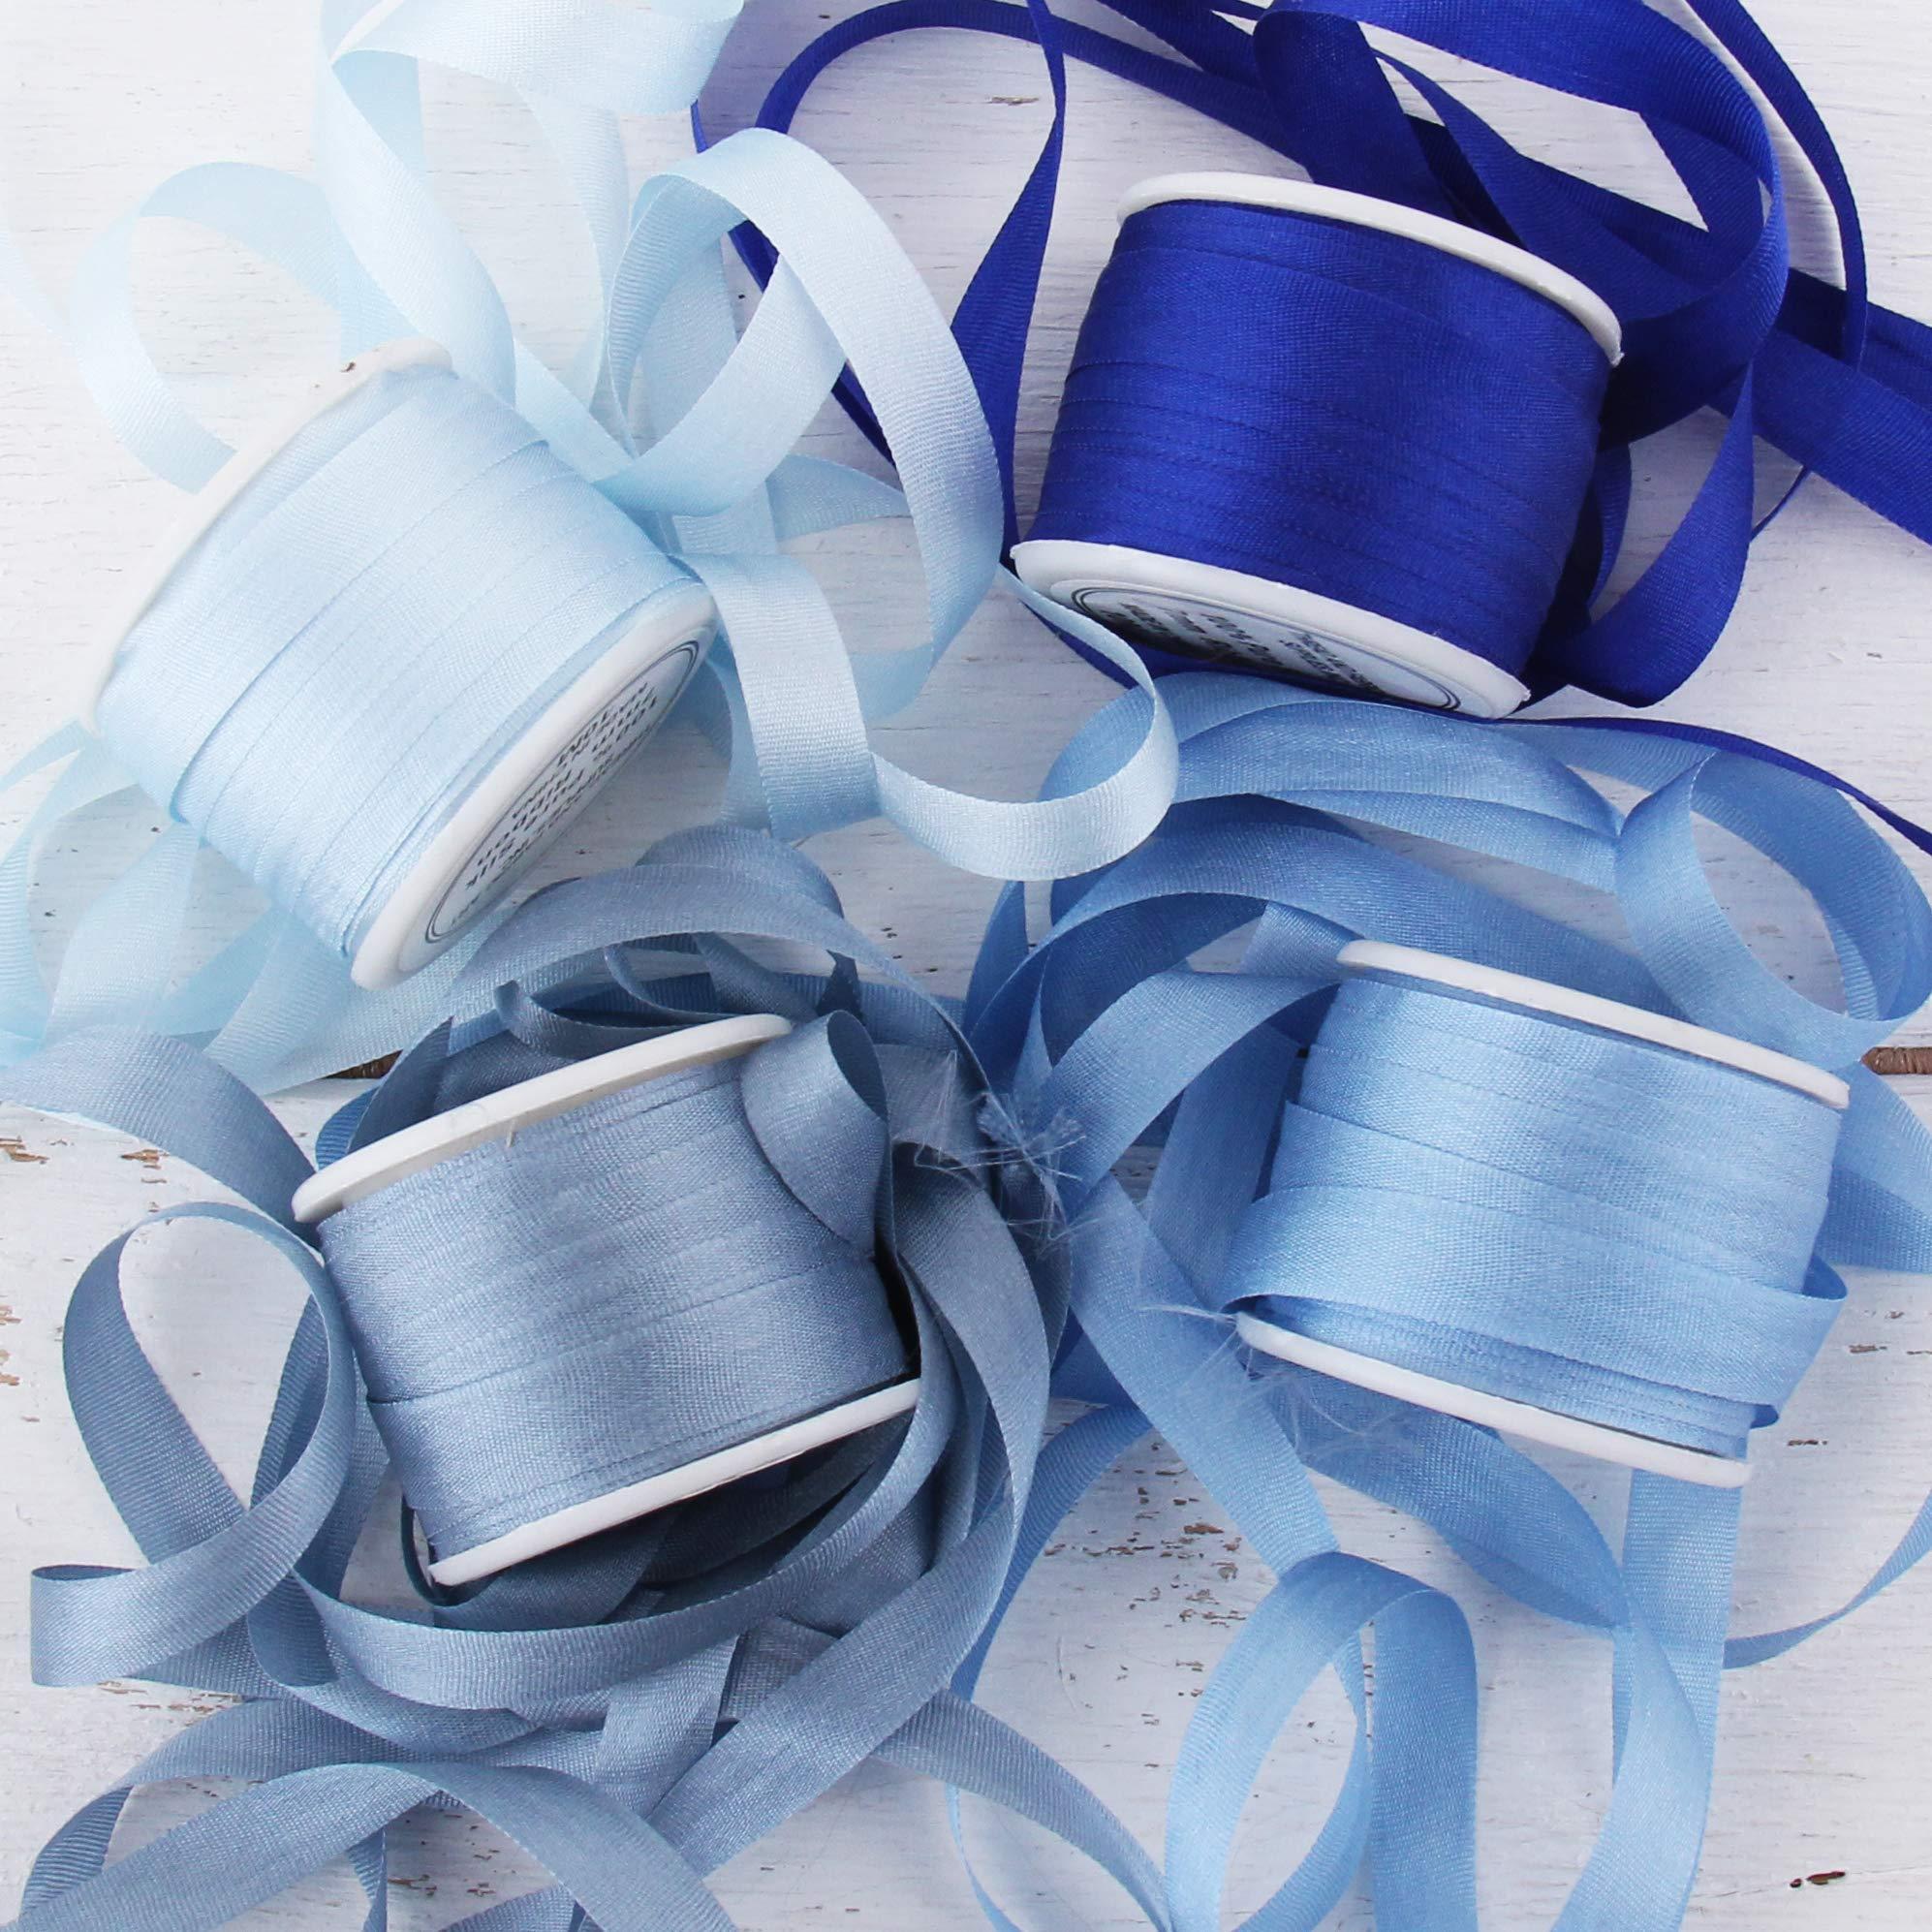 Threadart 7mm Silk Ribbon Set - Blue Shades - Four Spool Collection - 100% Pure Silk Ribbon - 10m (11yd) Spools - 44 Yards of Ribbon